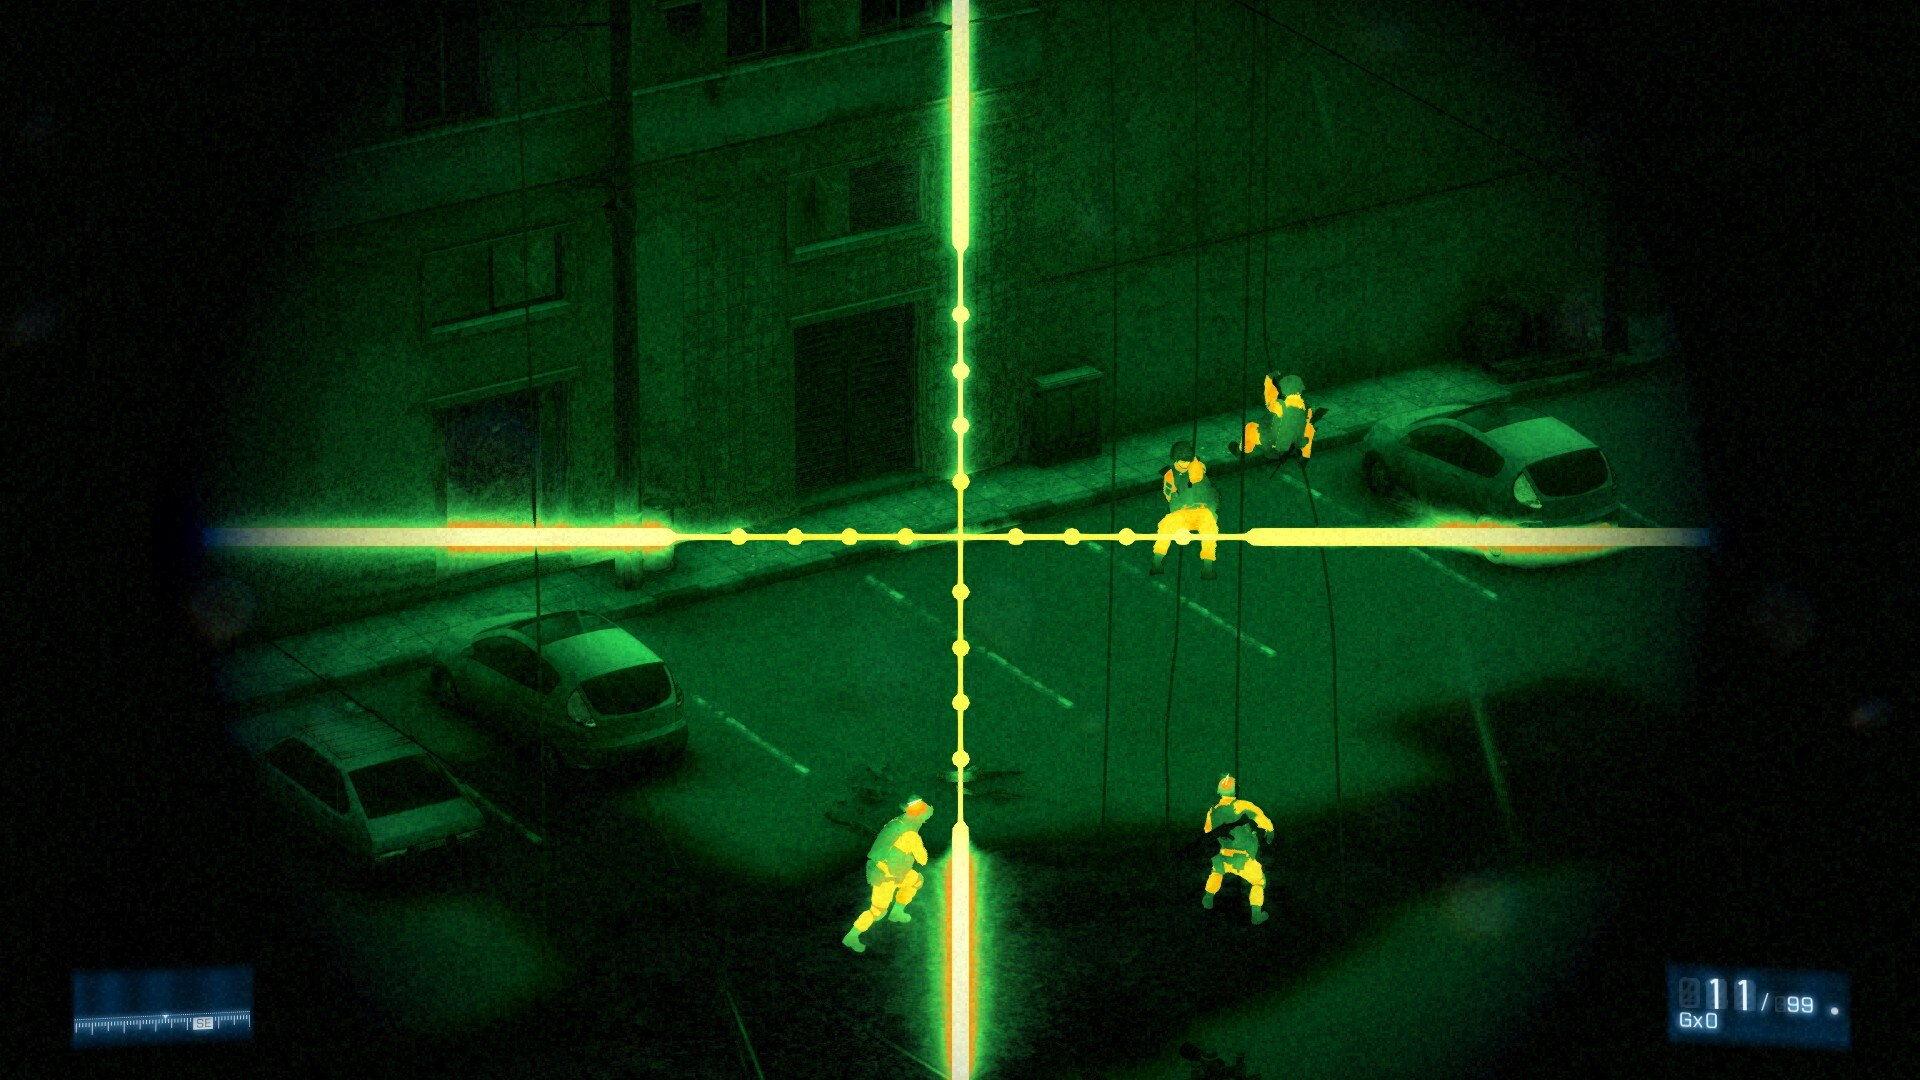 zfjunhgfvhb.jpg - Battlefield 3